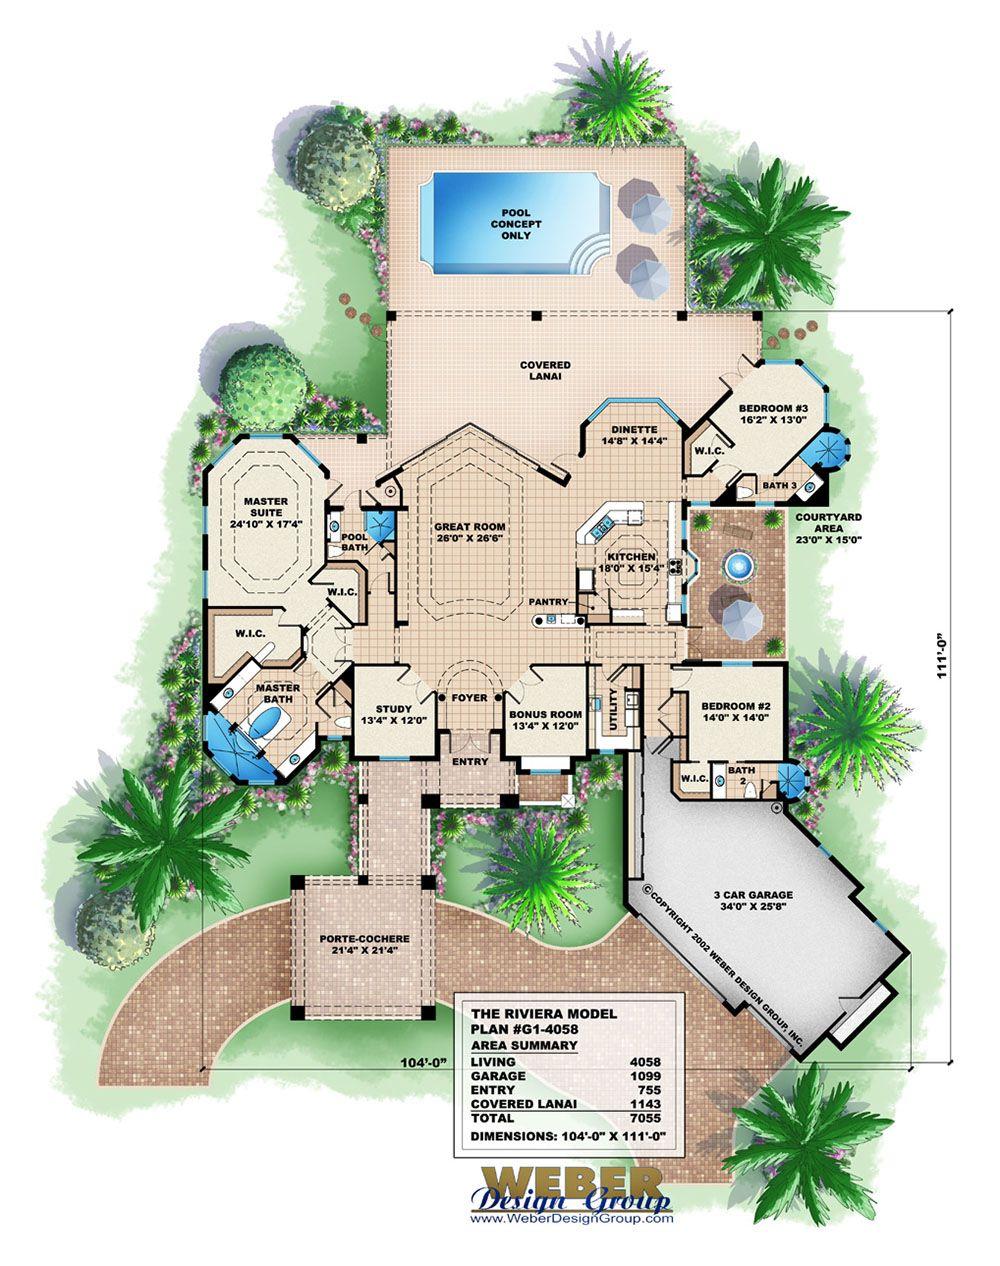 Mediterranean House Plan Waterfront Or Golf Course Home Floor Plan In 2020 Mediterranean House Plan Mediterranean Homes Home Design Plans